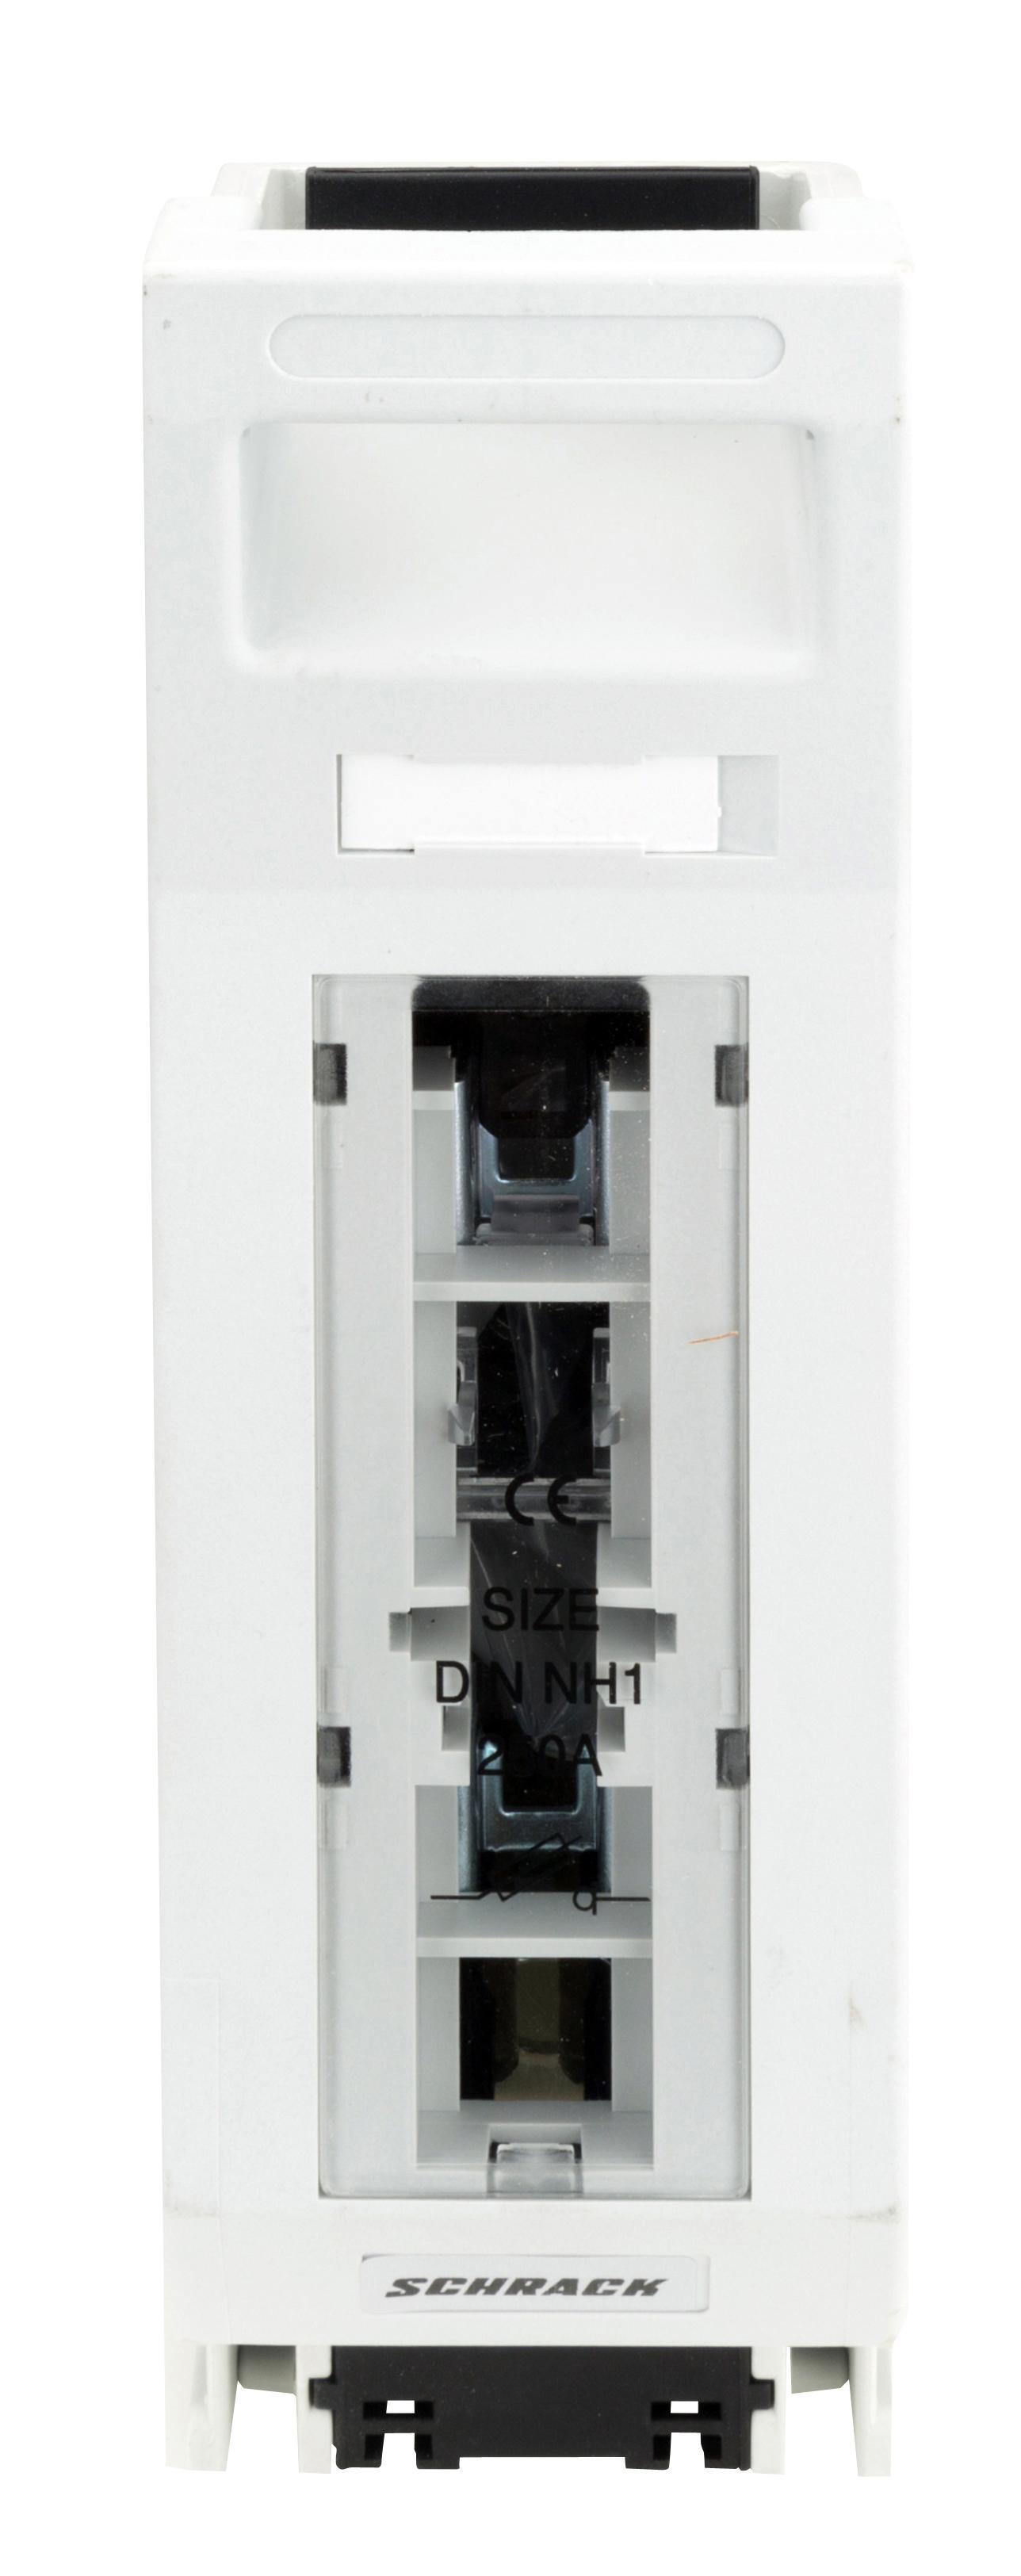 1 Stk NH-Trenner, ARROW-BLOC, Größe 1, 1-polig, 250A, M10 ISA05227--